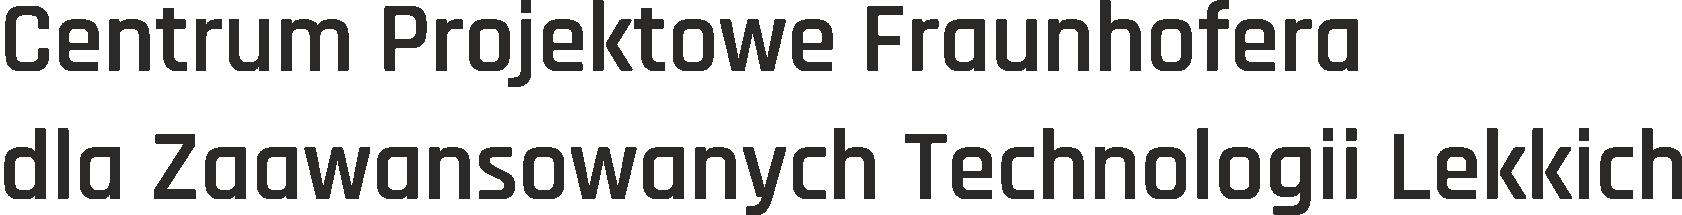 FPC - Centrum Projektowe Fraunhofer